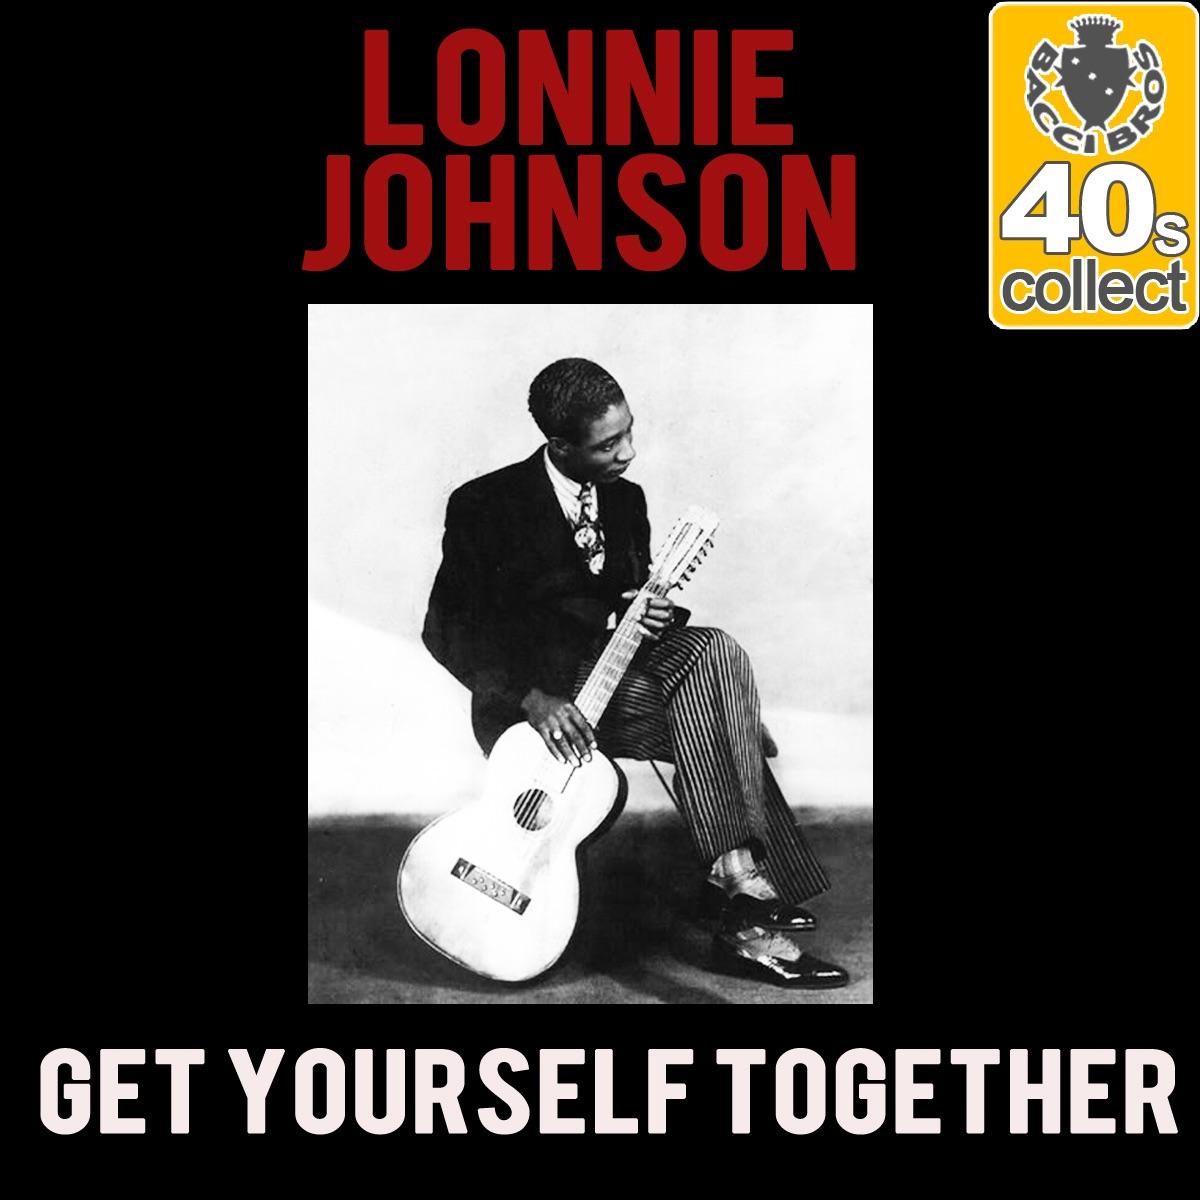 Get Yourself Together (Remastered) - Single